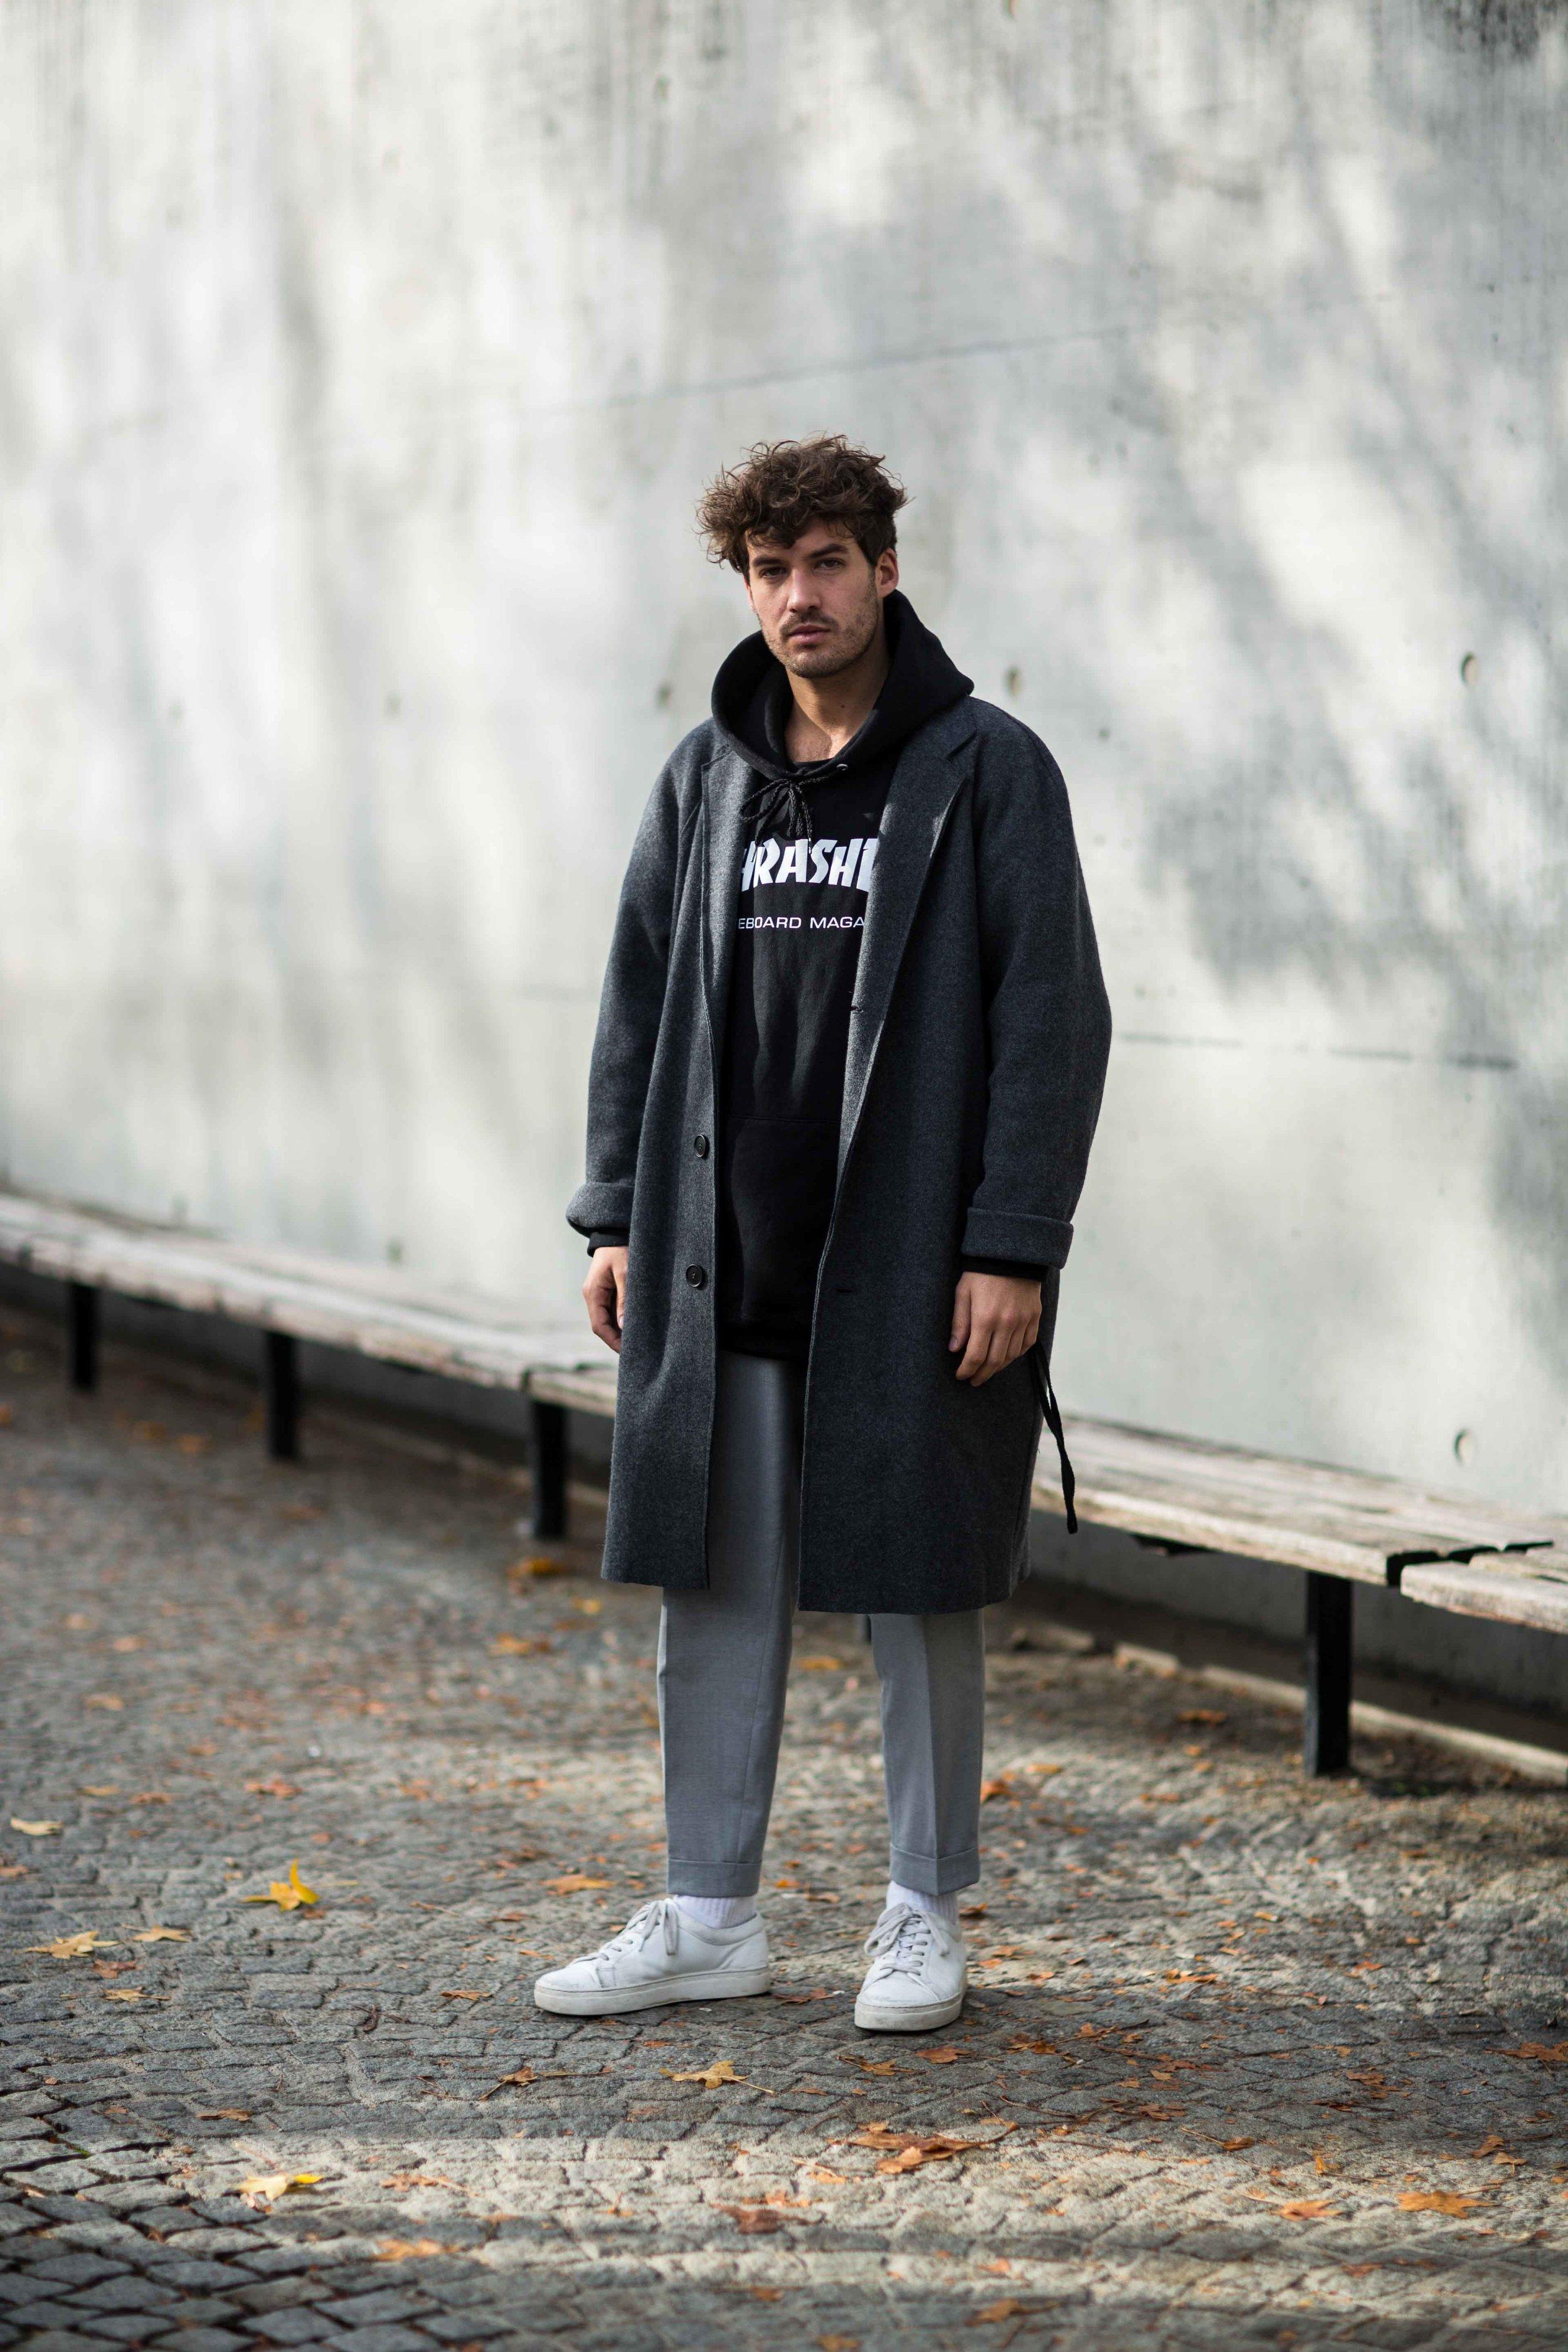 street-style-fashion-blog-innsbruck-marcel